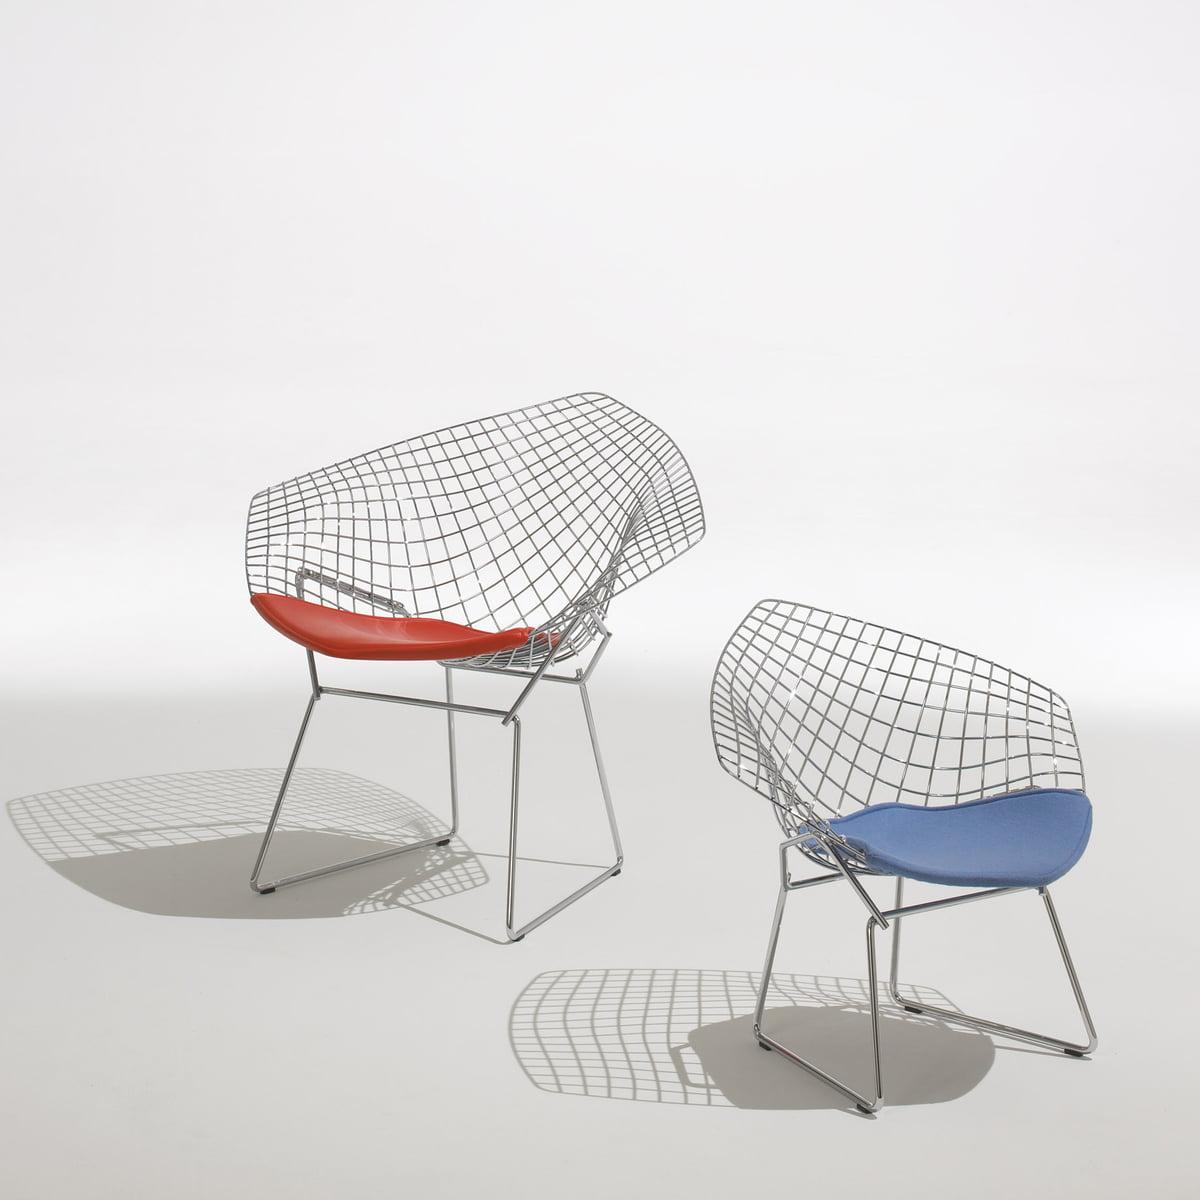 Bertoia diamond chair dimensions - Knoll Bertoia Diamond Lounger